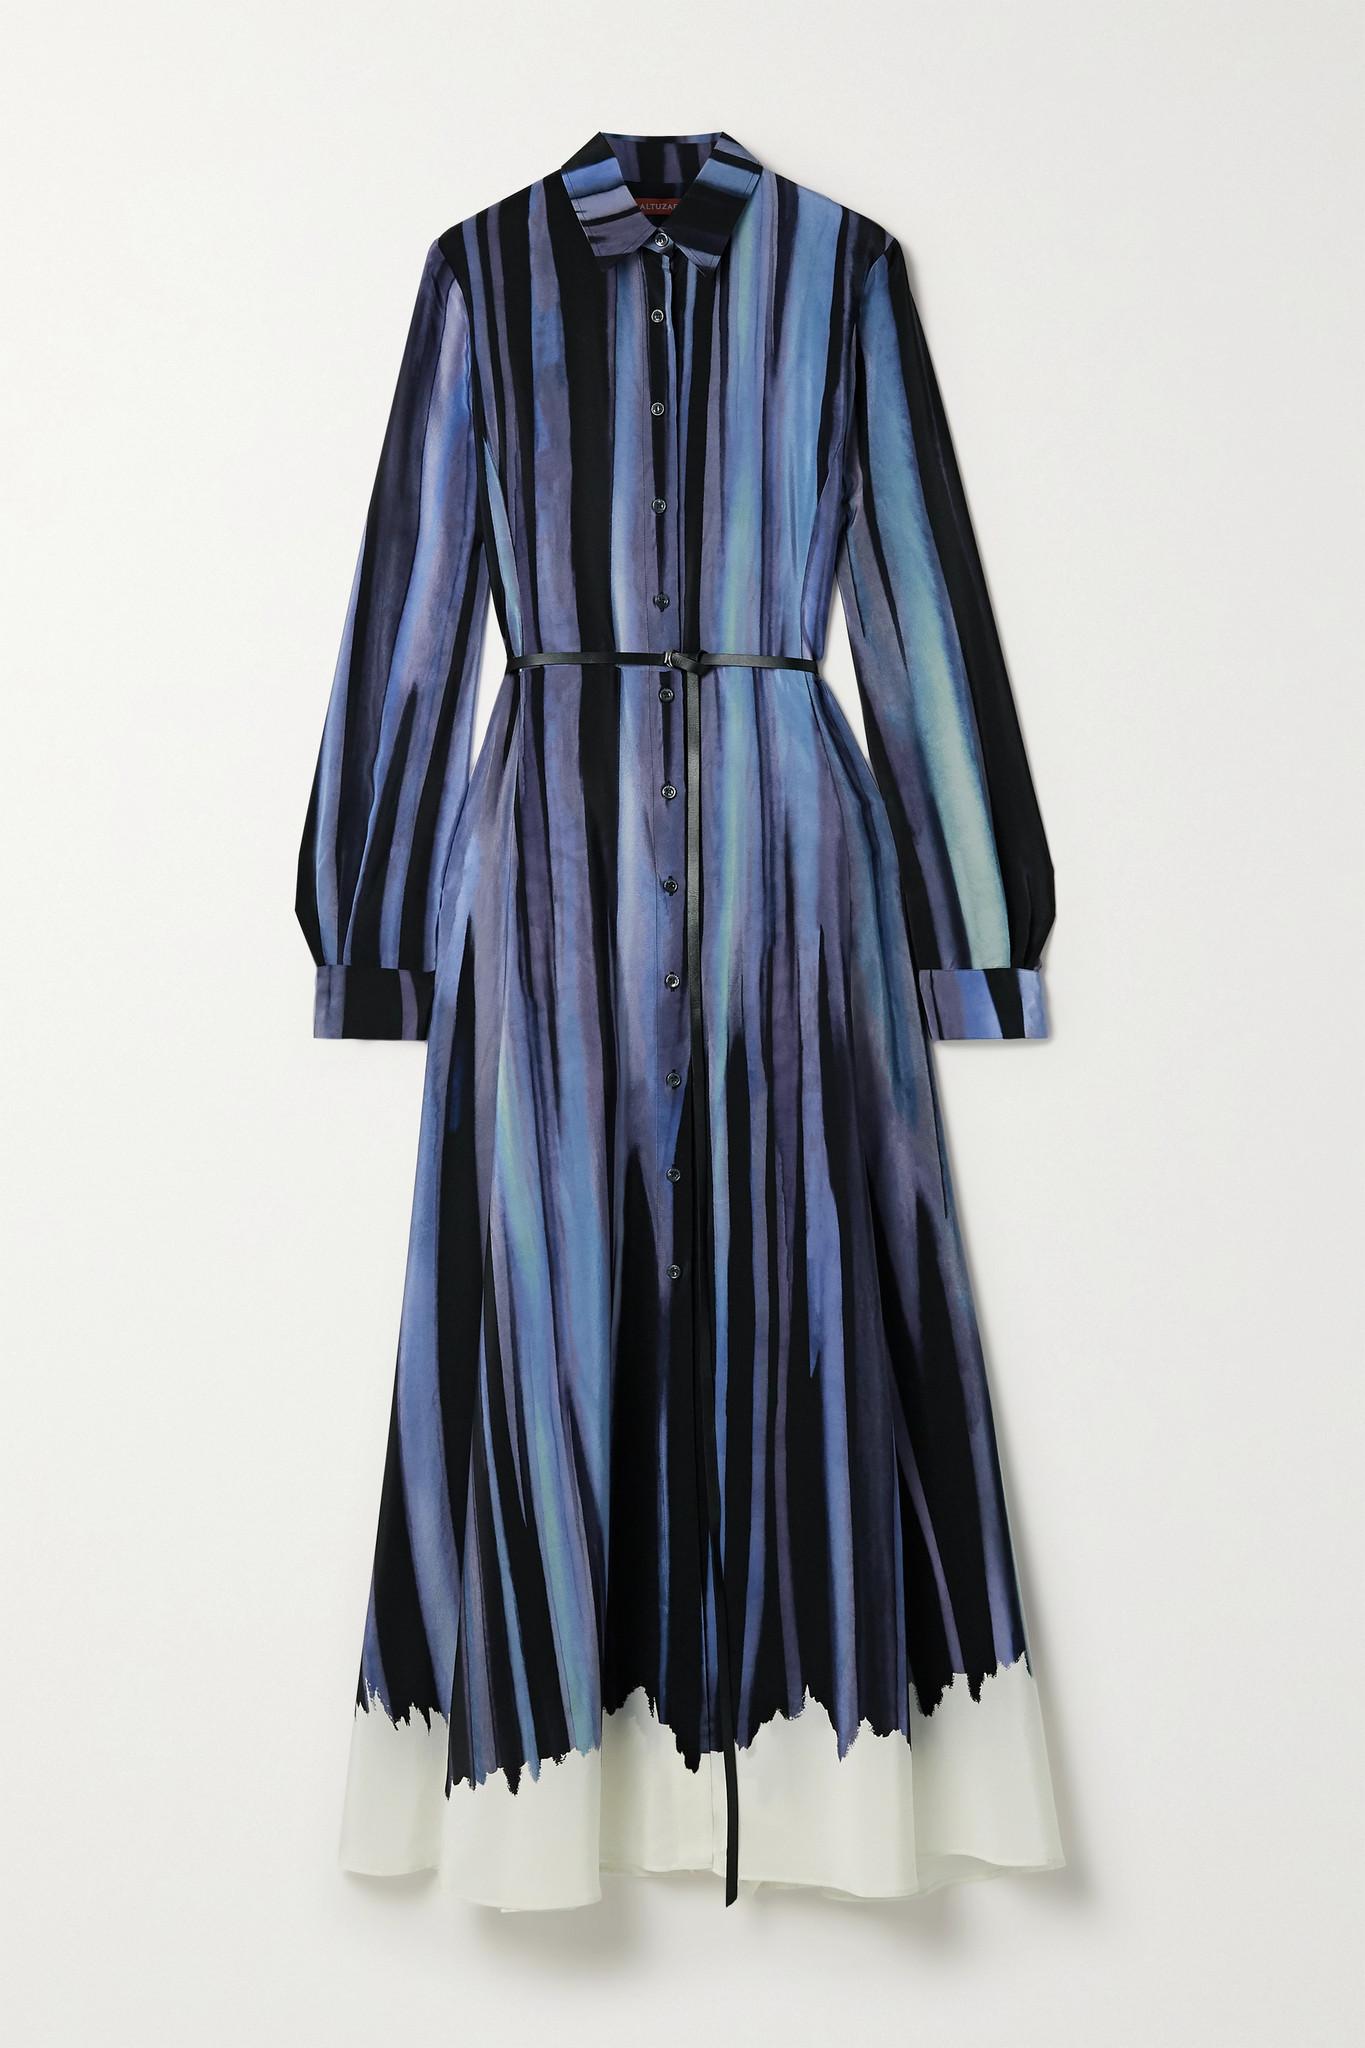 ALTUZARRA - Judina Belted Printed Silk Crepe De Chine Midi Shirt Dress - Blue - FR42